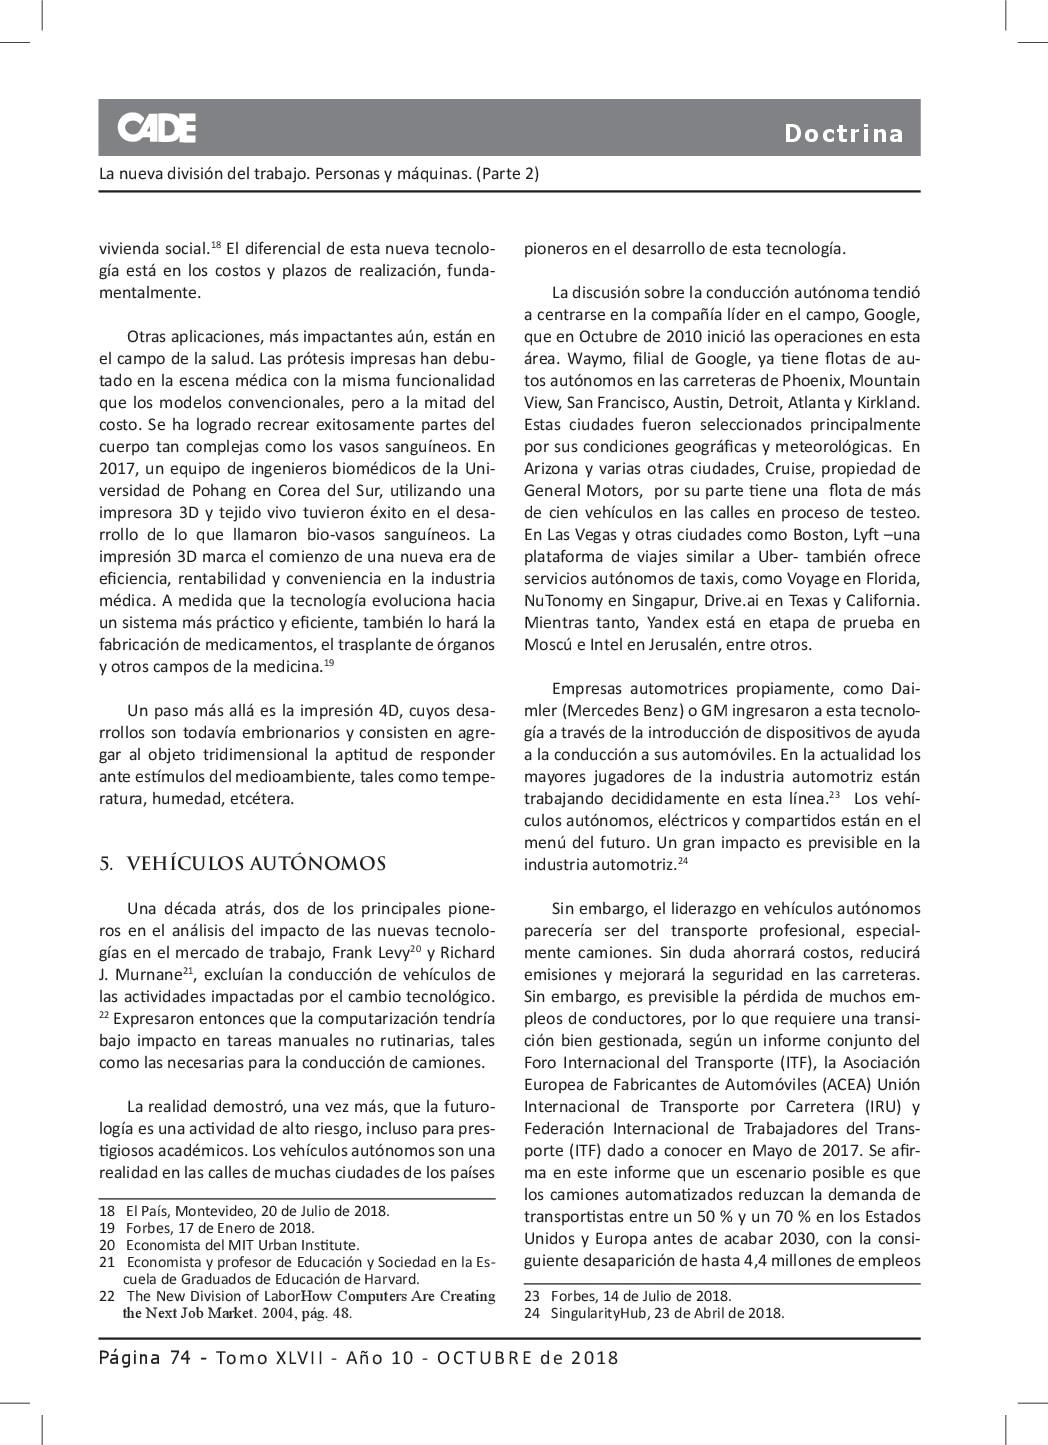 cade-doctrina-jurisprudencia-saldain-006